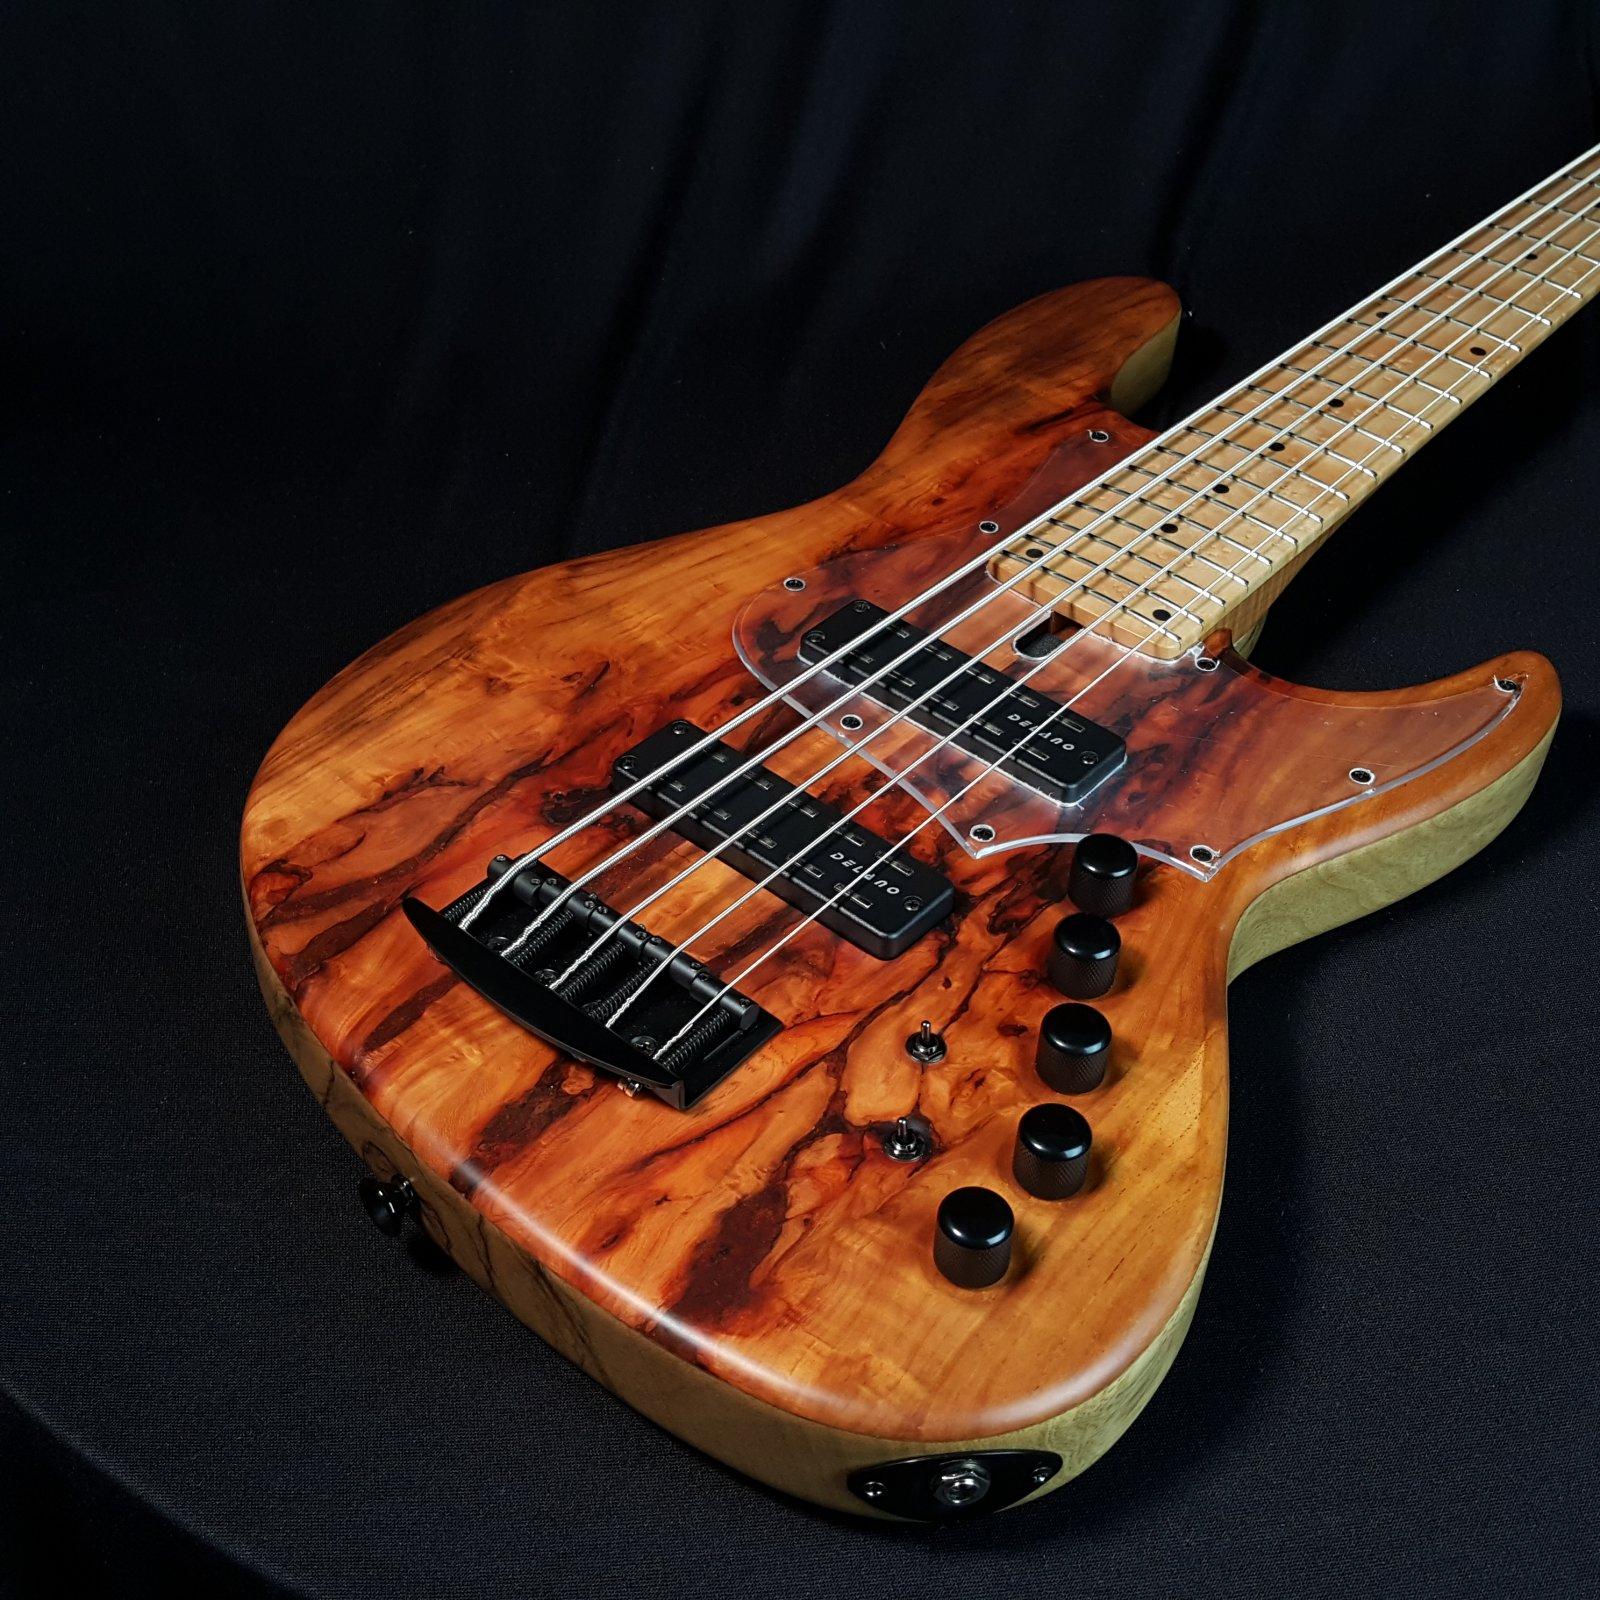 Maruszczyk Elwood L5a 5 String Custom Padouk, Korina